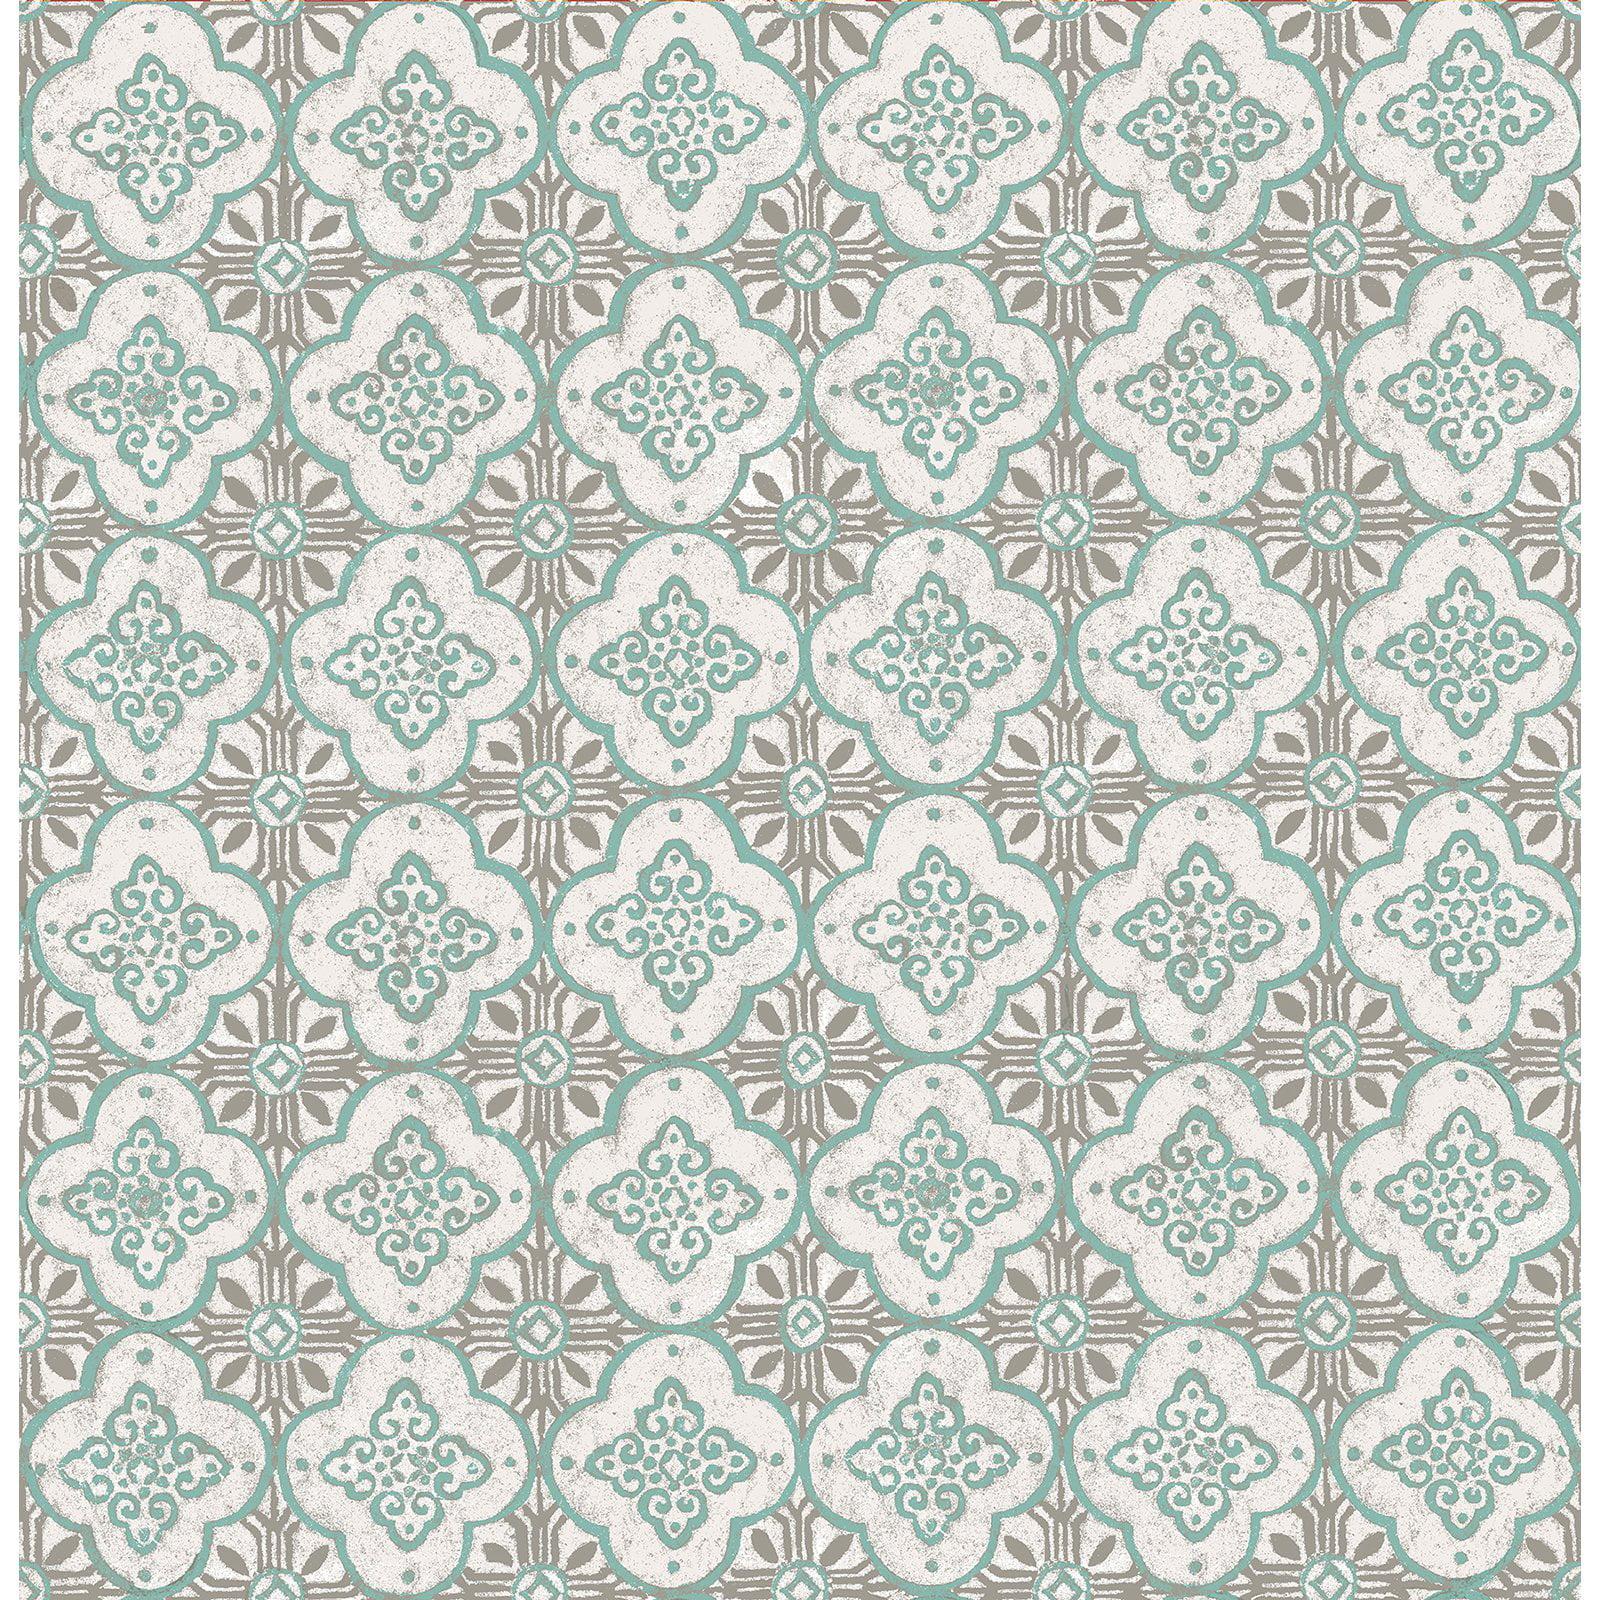 Image of A - Street Prints Kismet Geo Quatrefoil Wallpaper